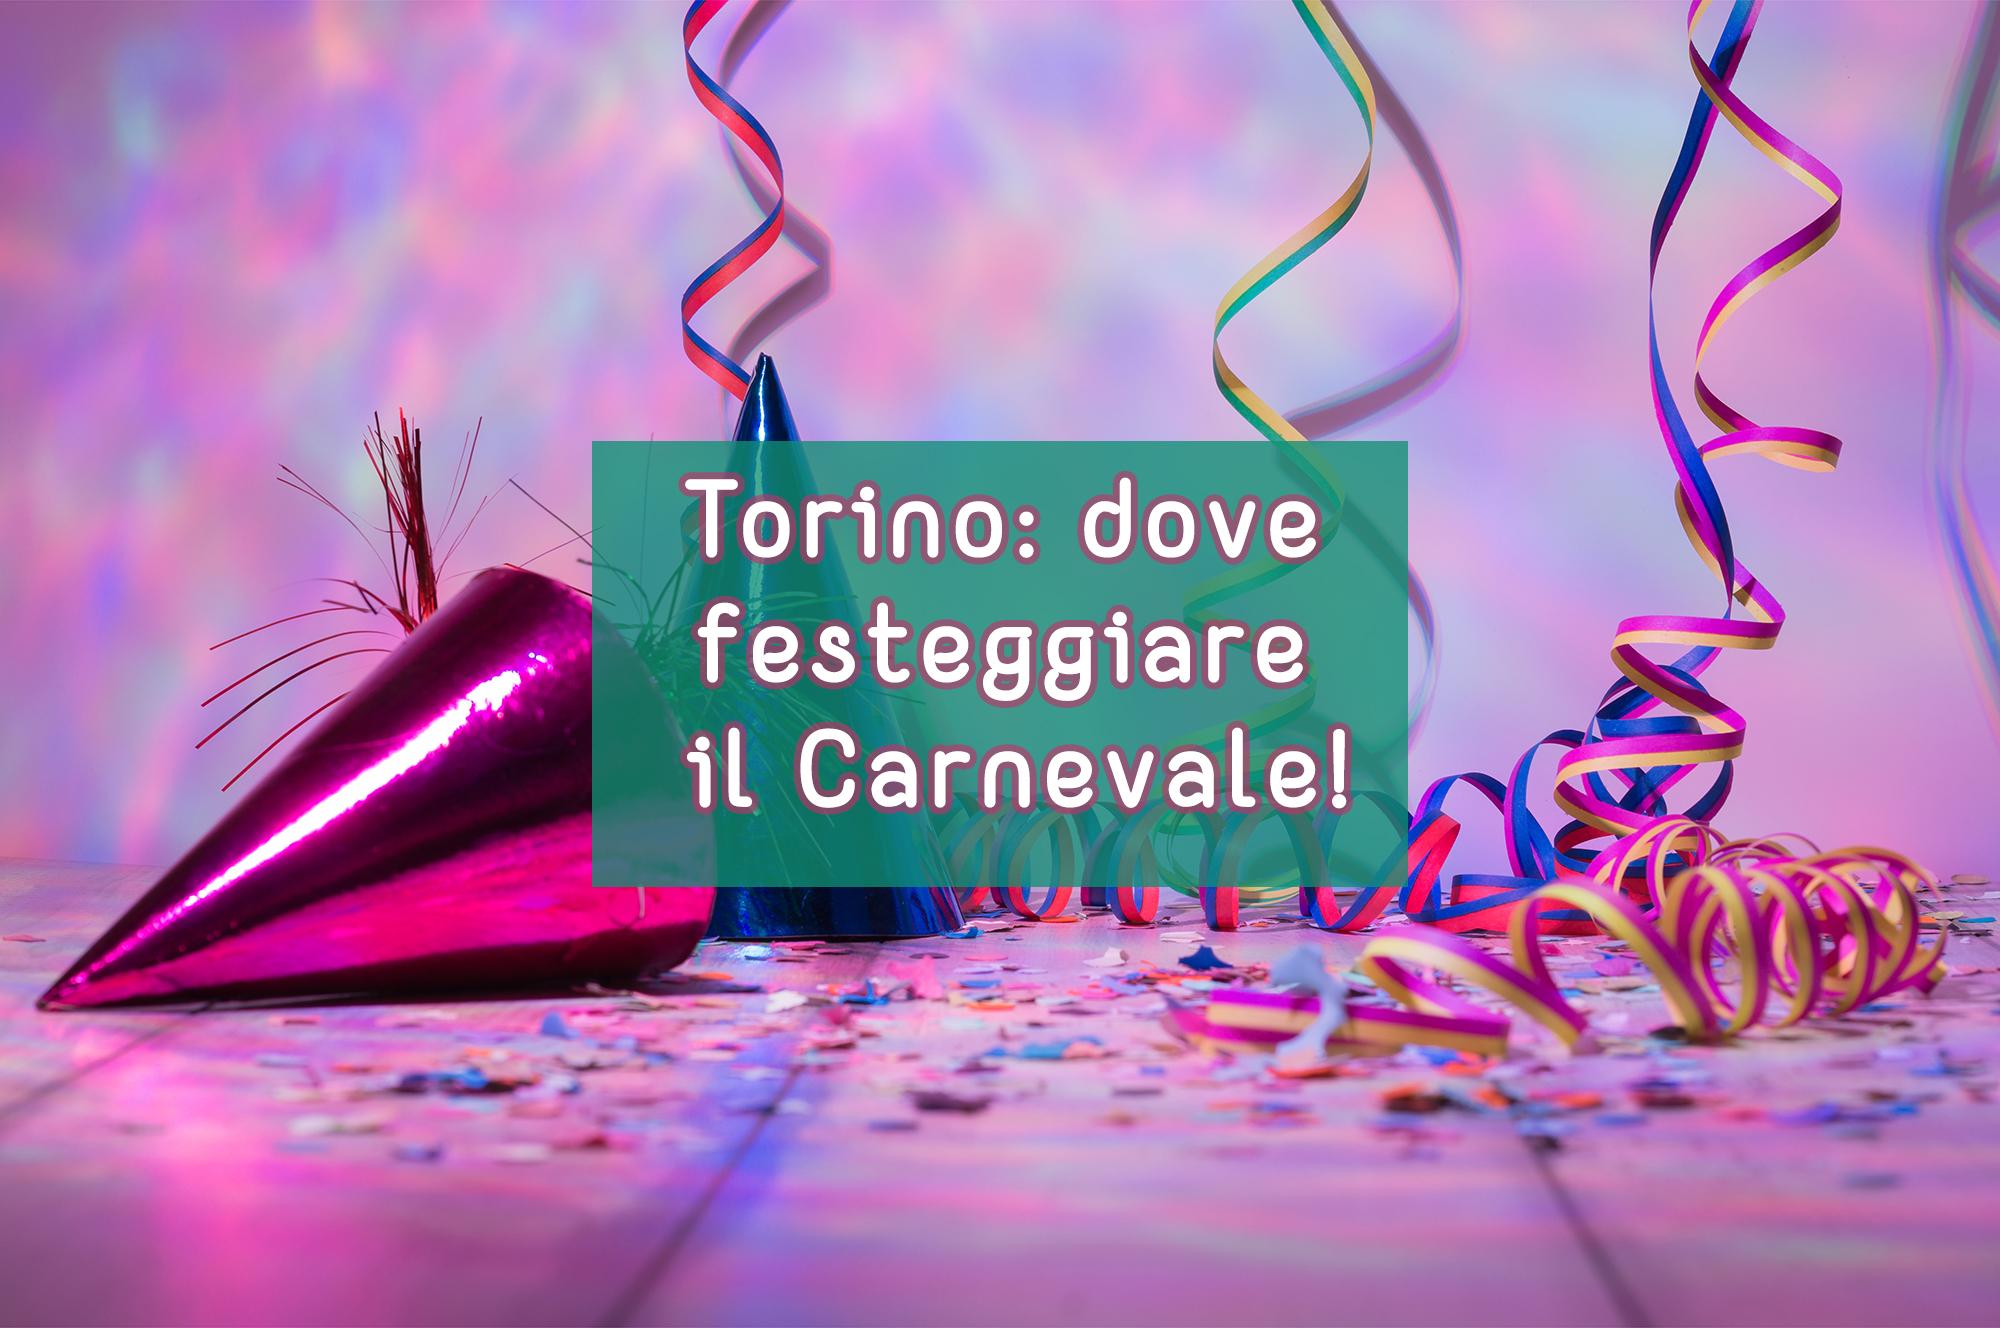 feste di carnevale a torino